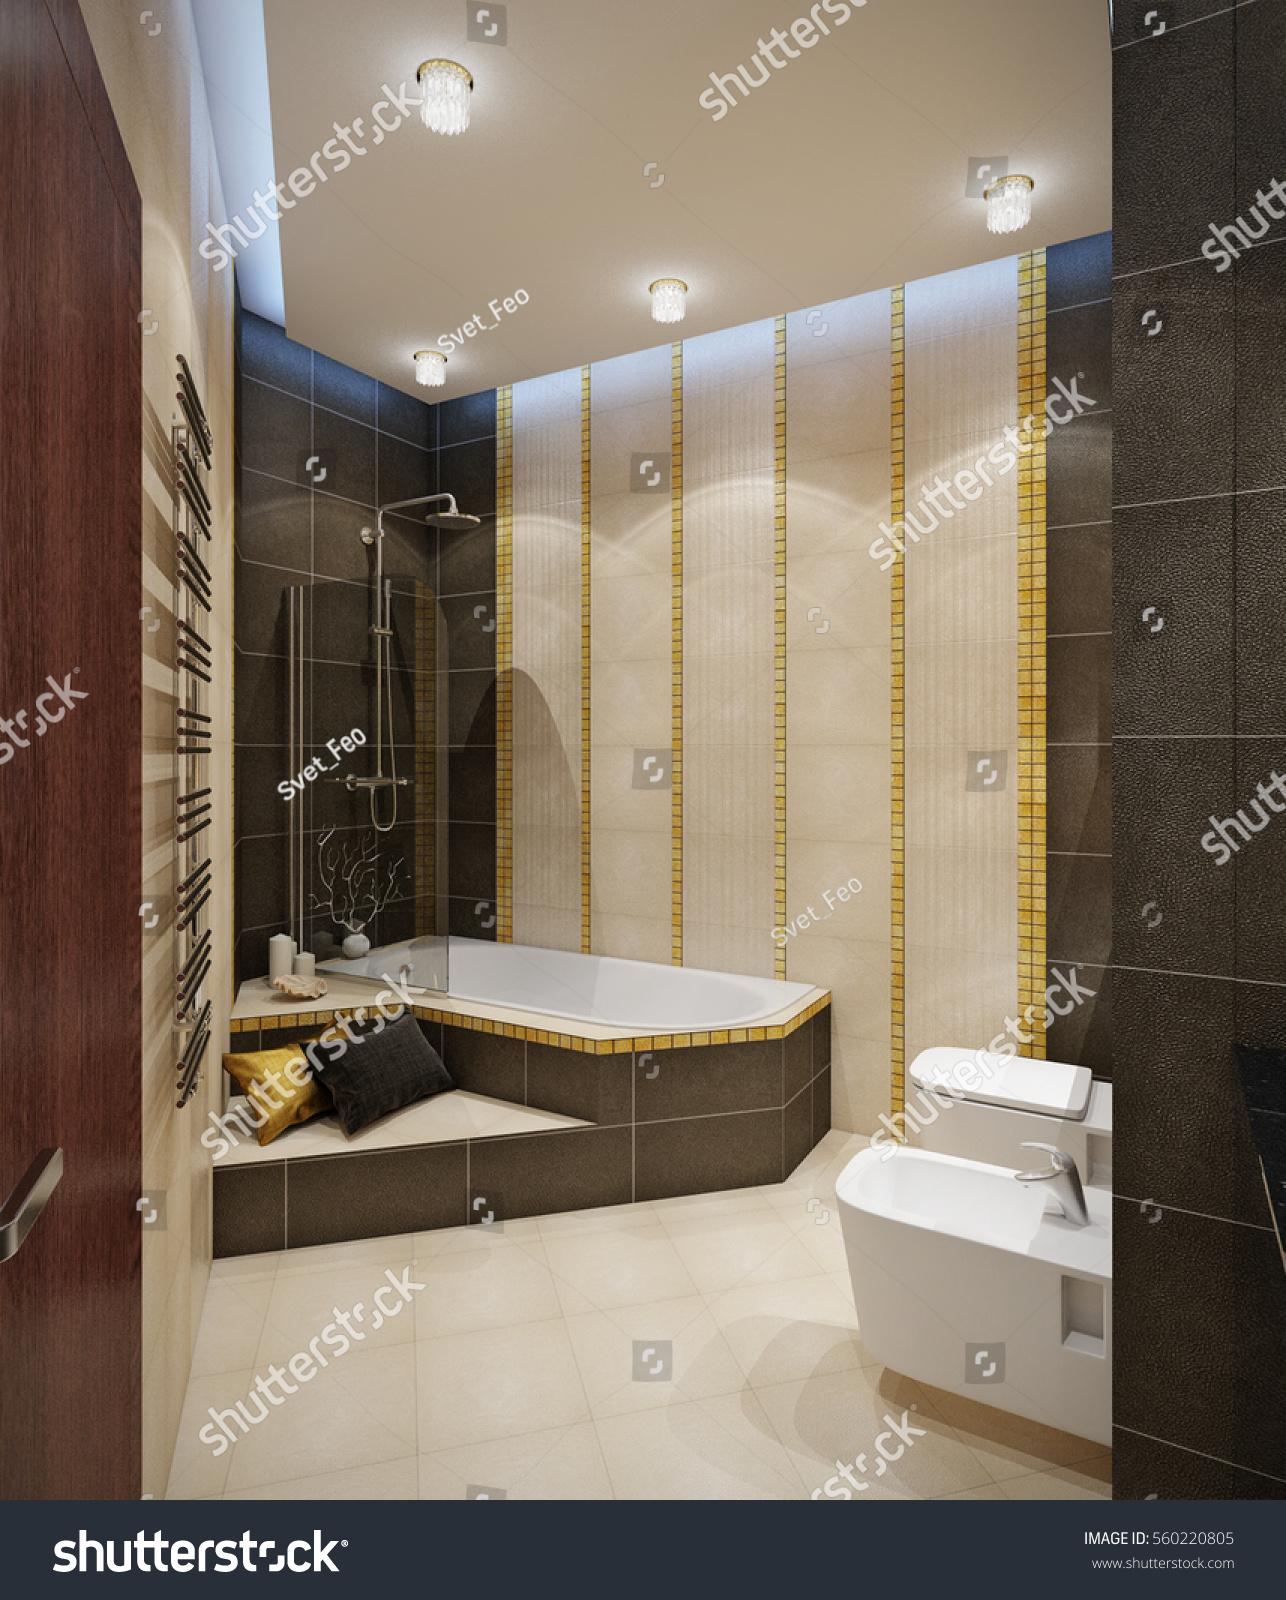 Royalty Free Stock Illustration of Bathroom Beige Tile Floor Beige